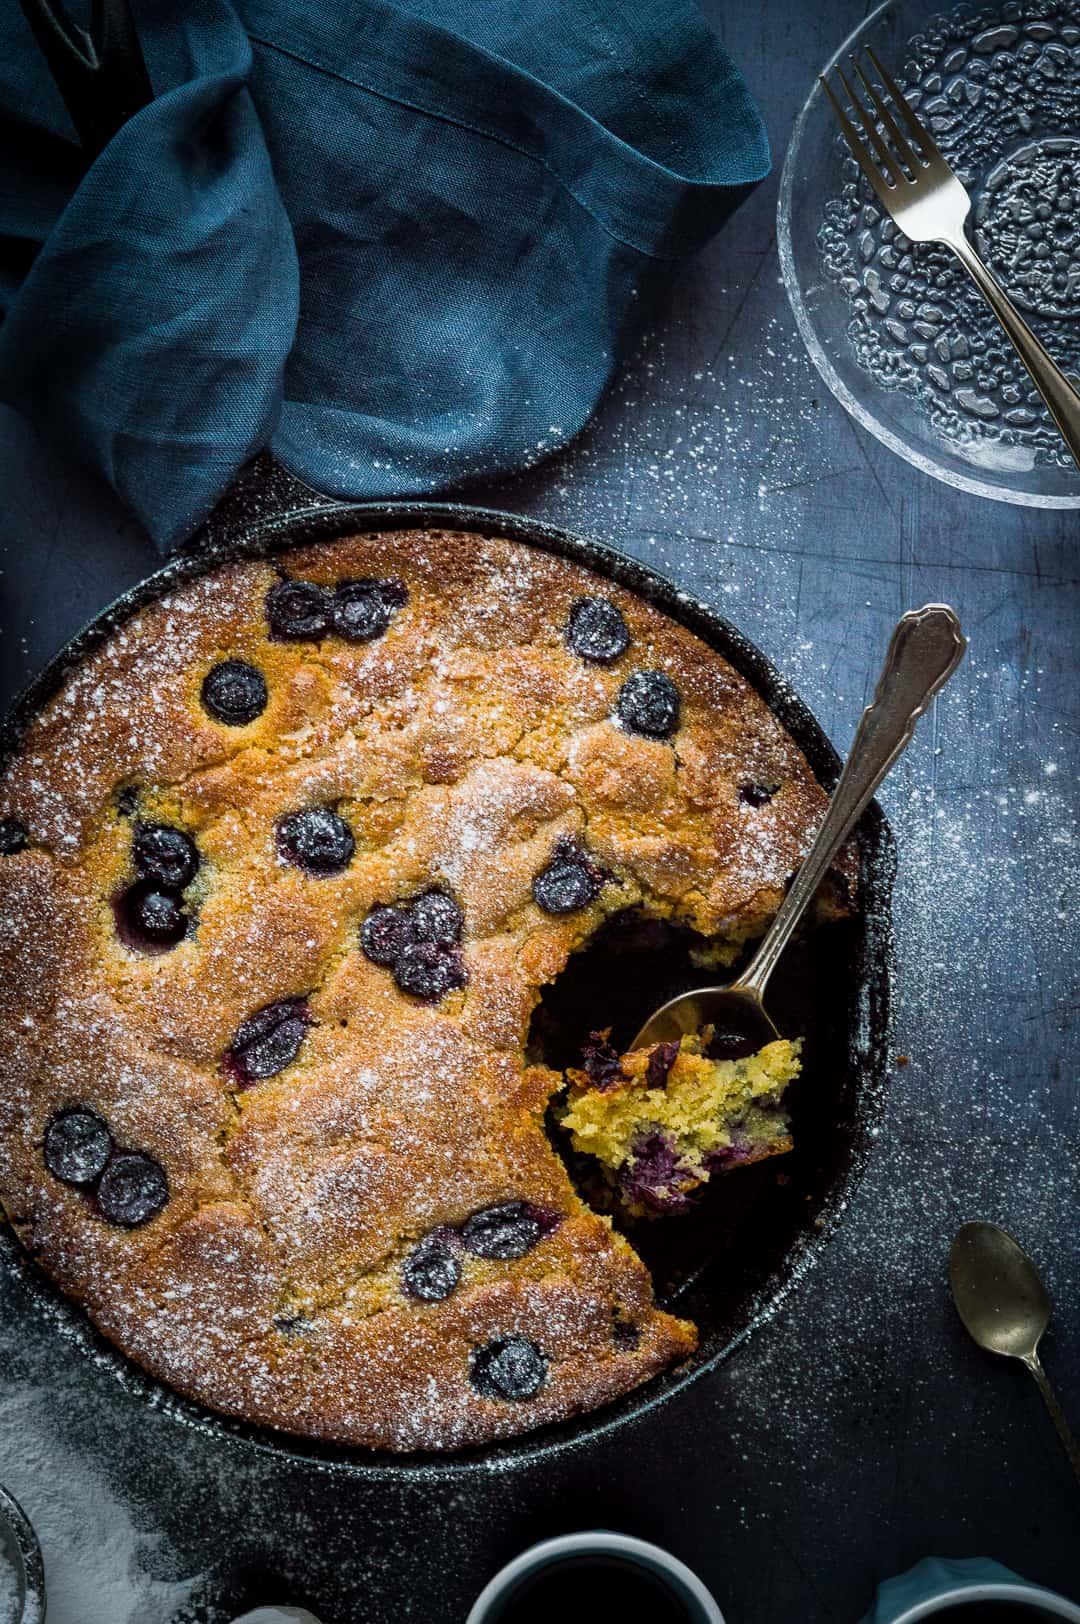 Blueberry cornmeal snack/breakfast cake